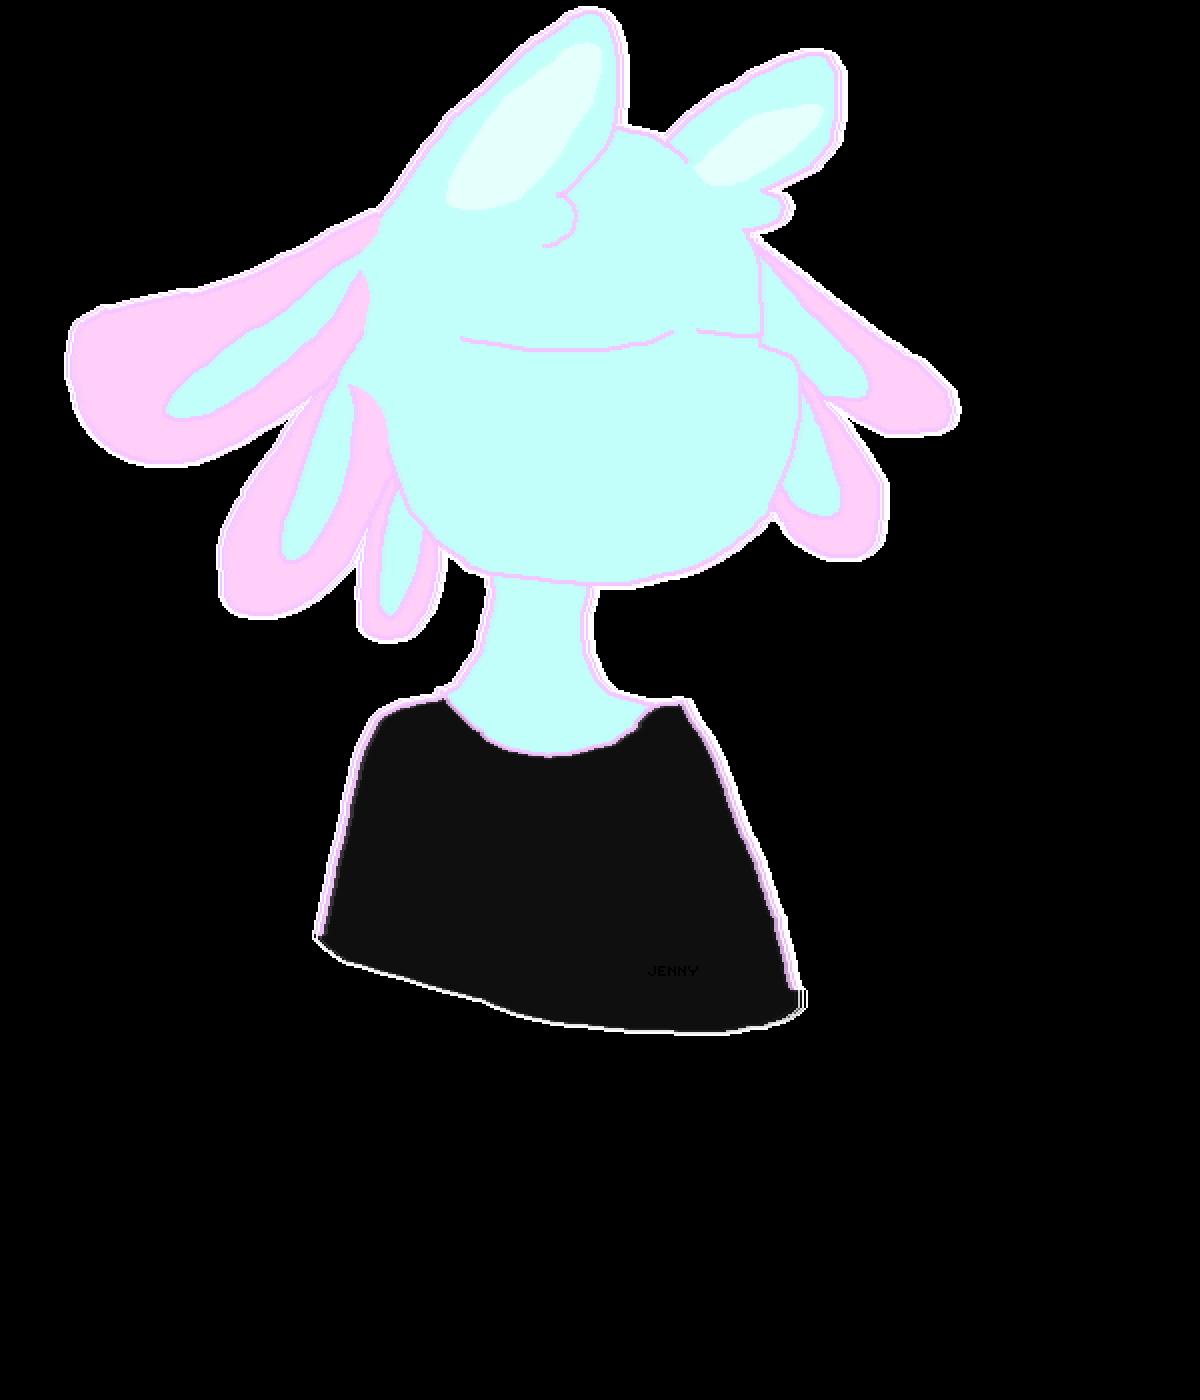 quick pastel doodle by Plush-Lulu